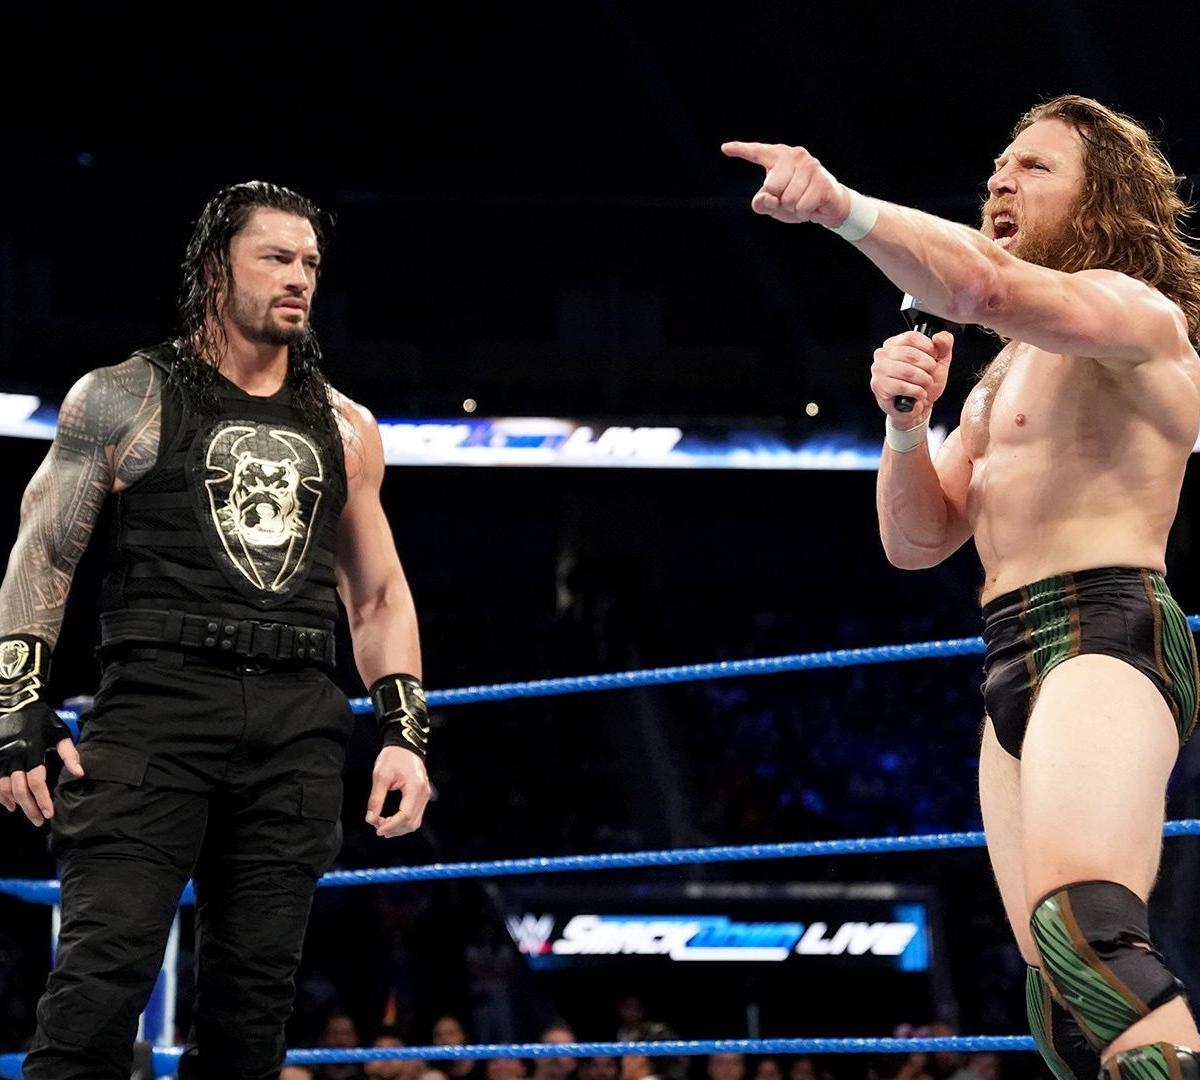 Daniel Bryan Babyface Turn Threatens Heel Depth and More WWE SmackDown Fallout